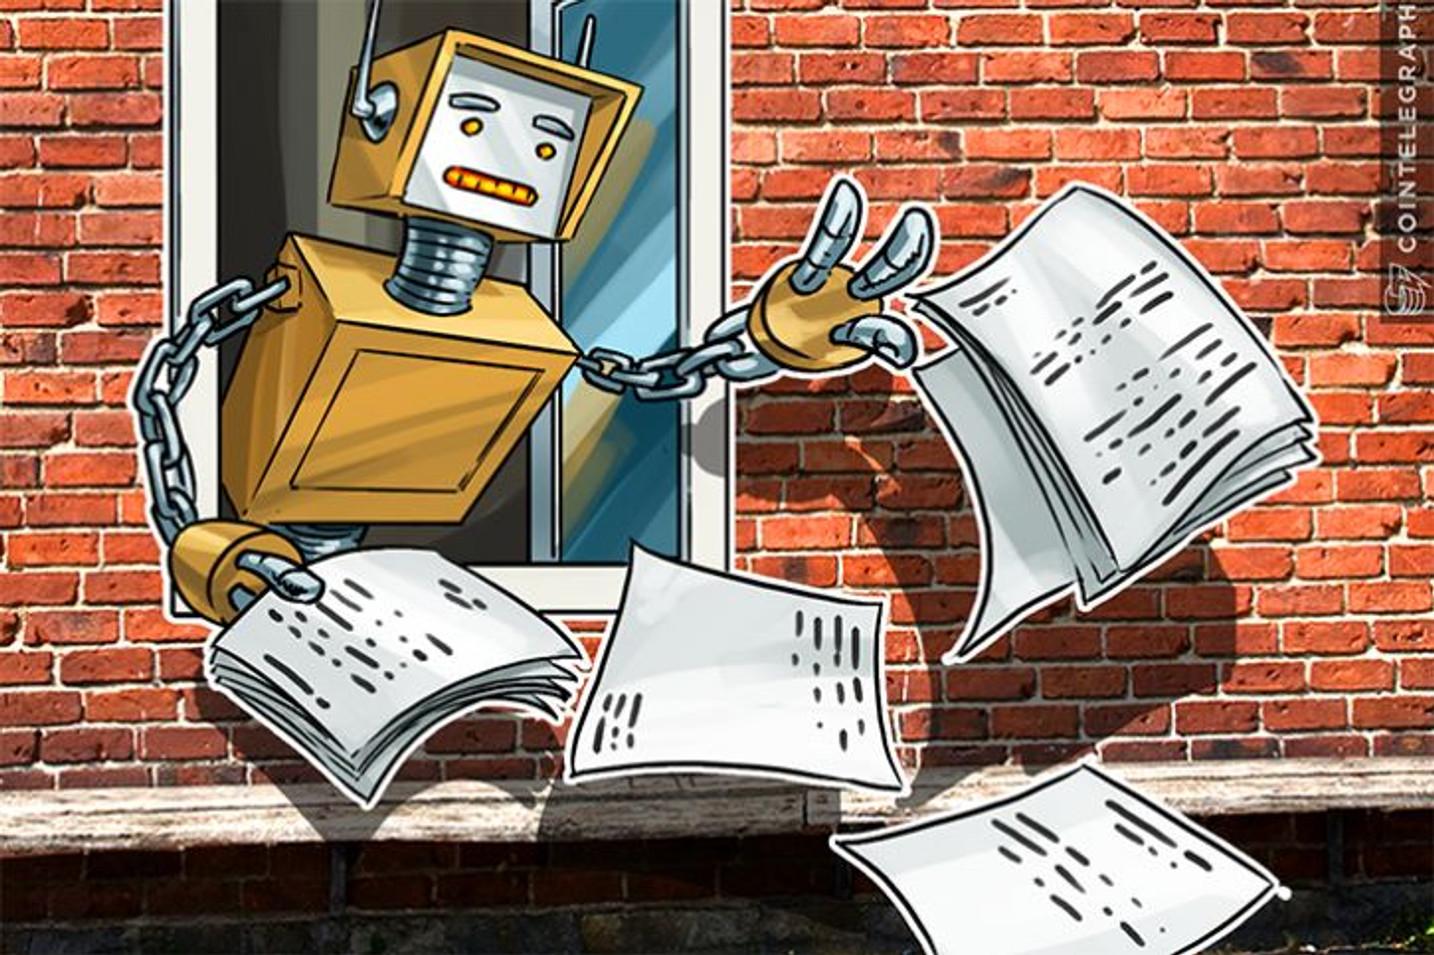 Ernst & Young promove Hackathon Blockchain na Índia